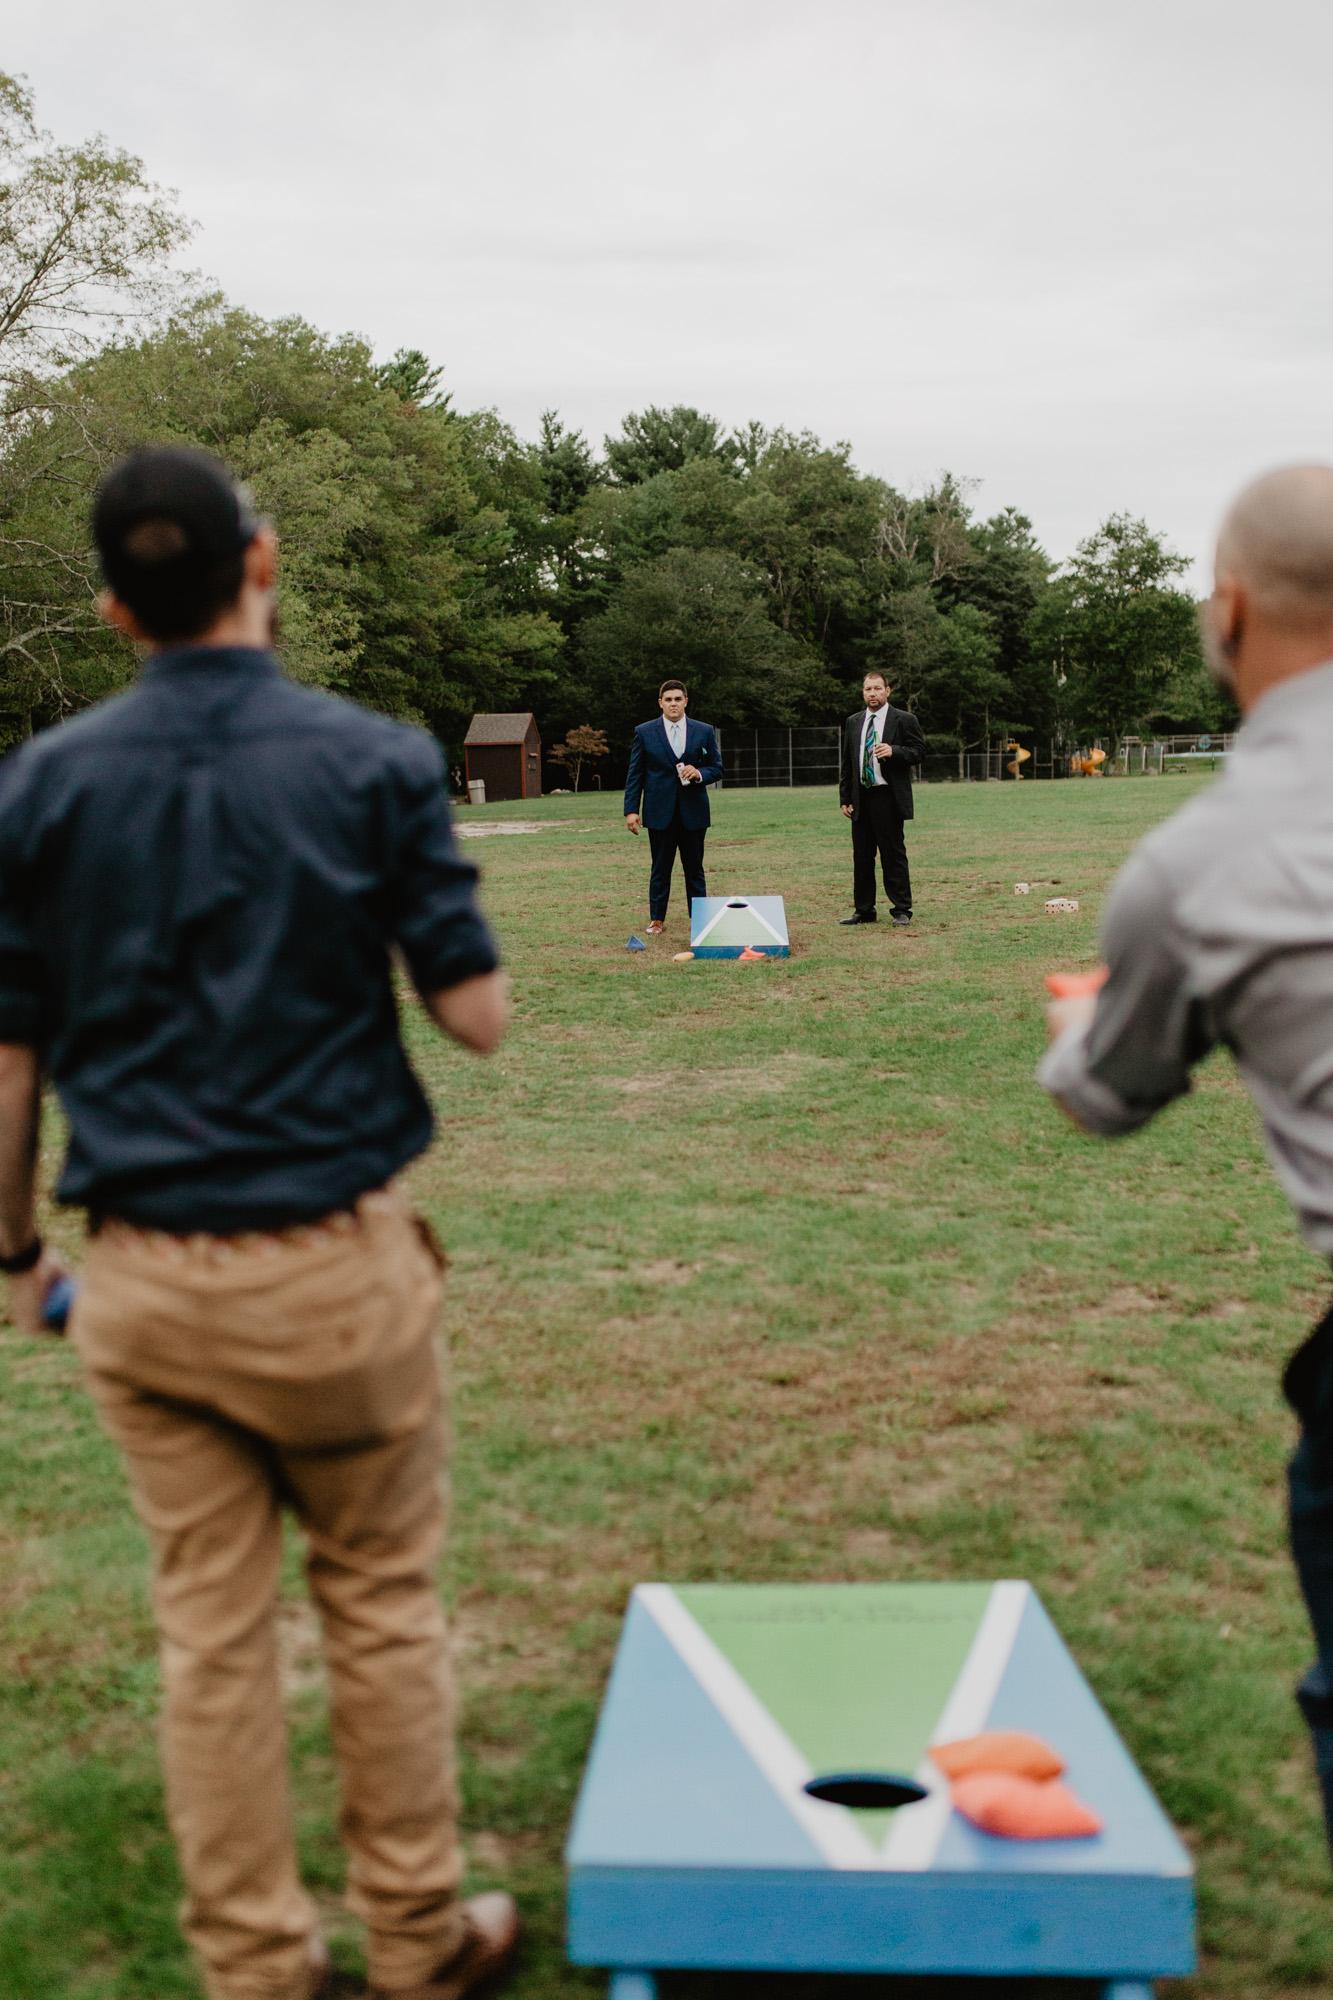 Guests play cornhole at Camp Wing wedding